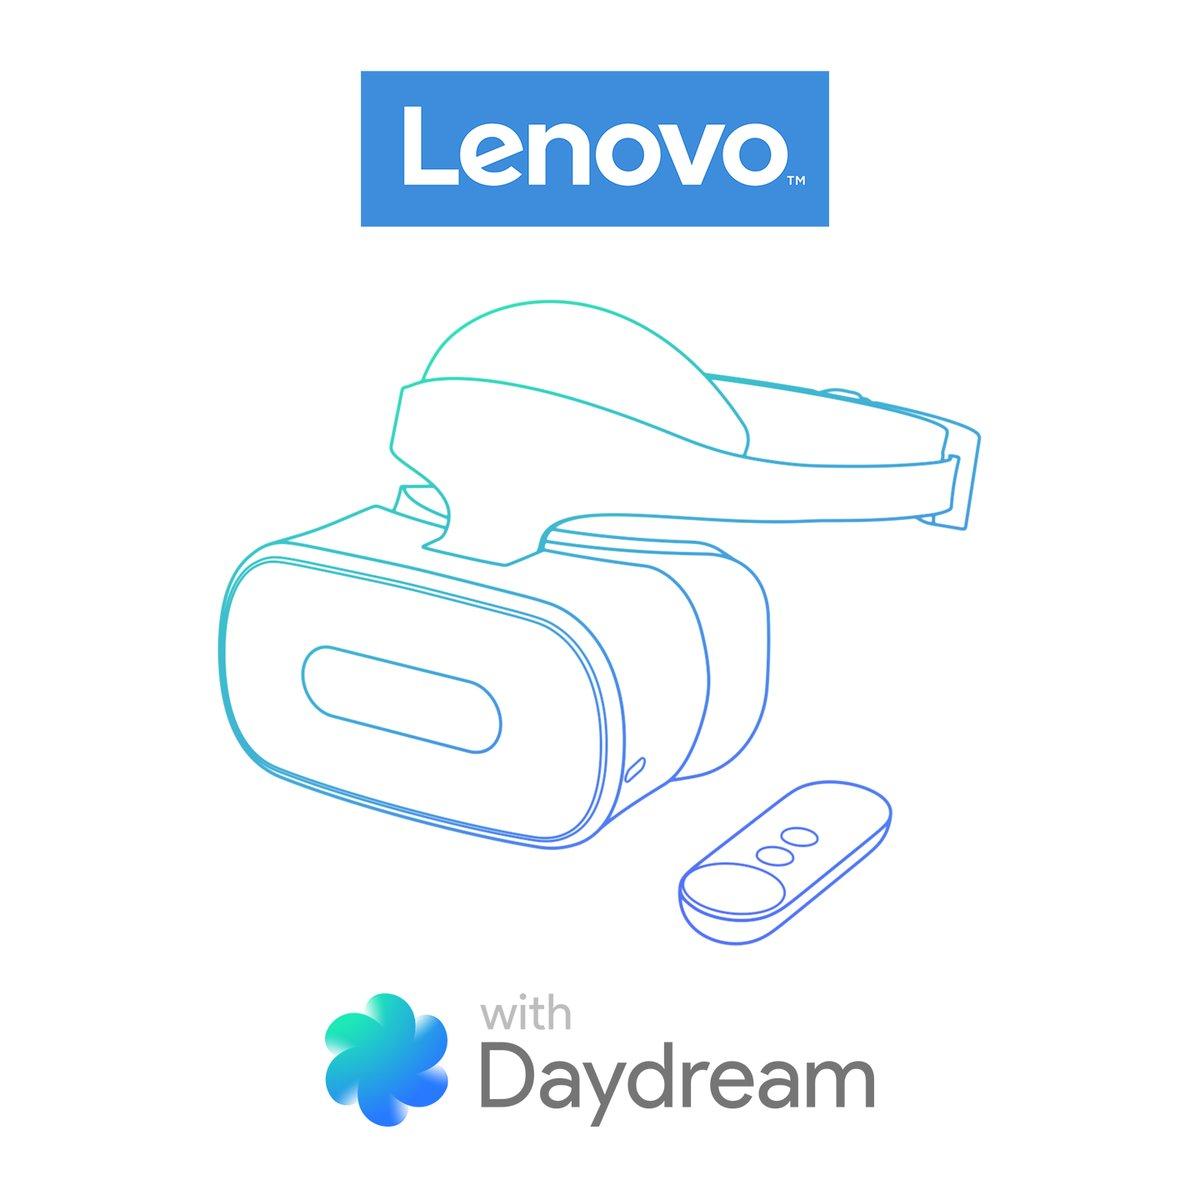 Lenovo Daydream